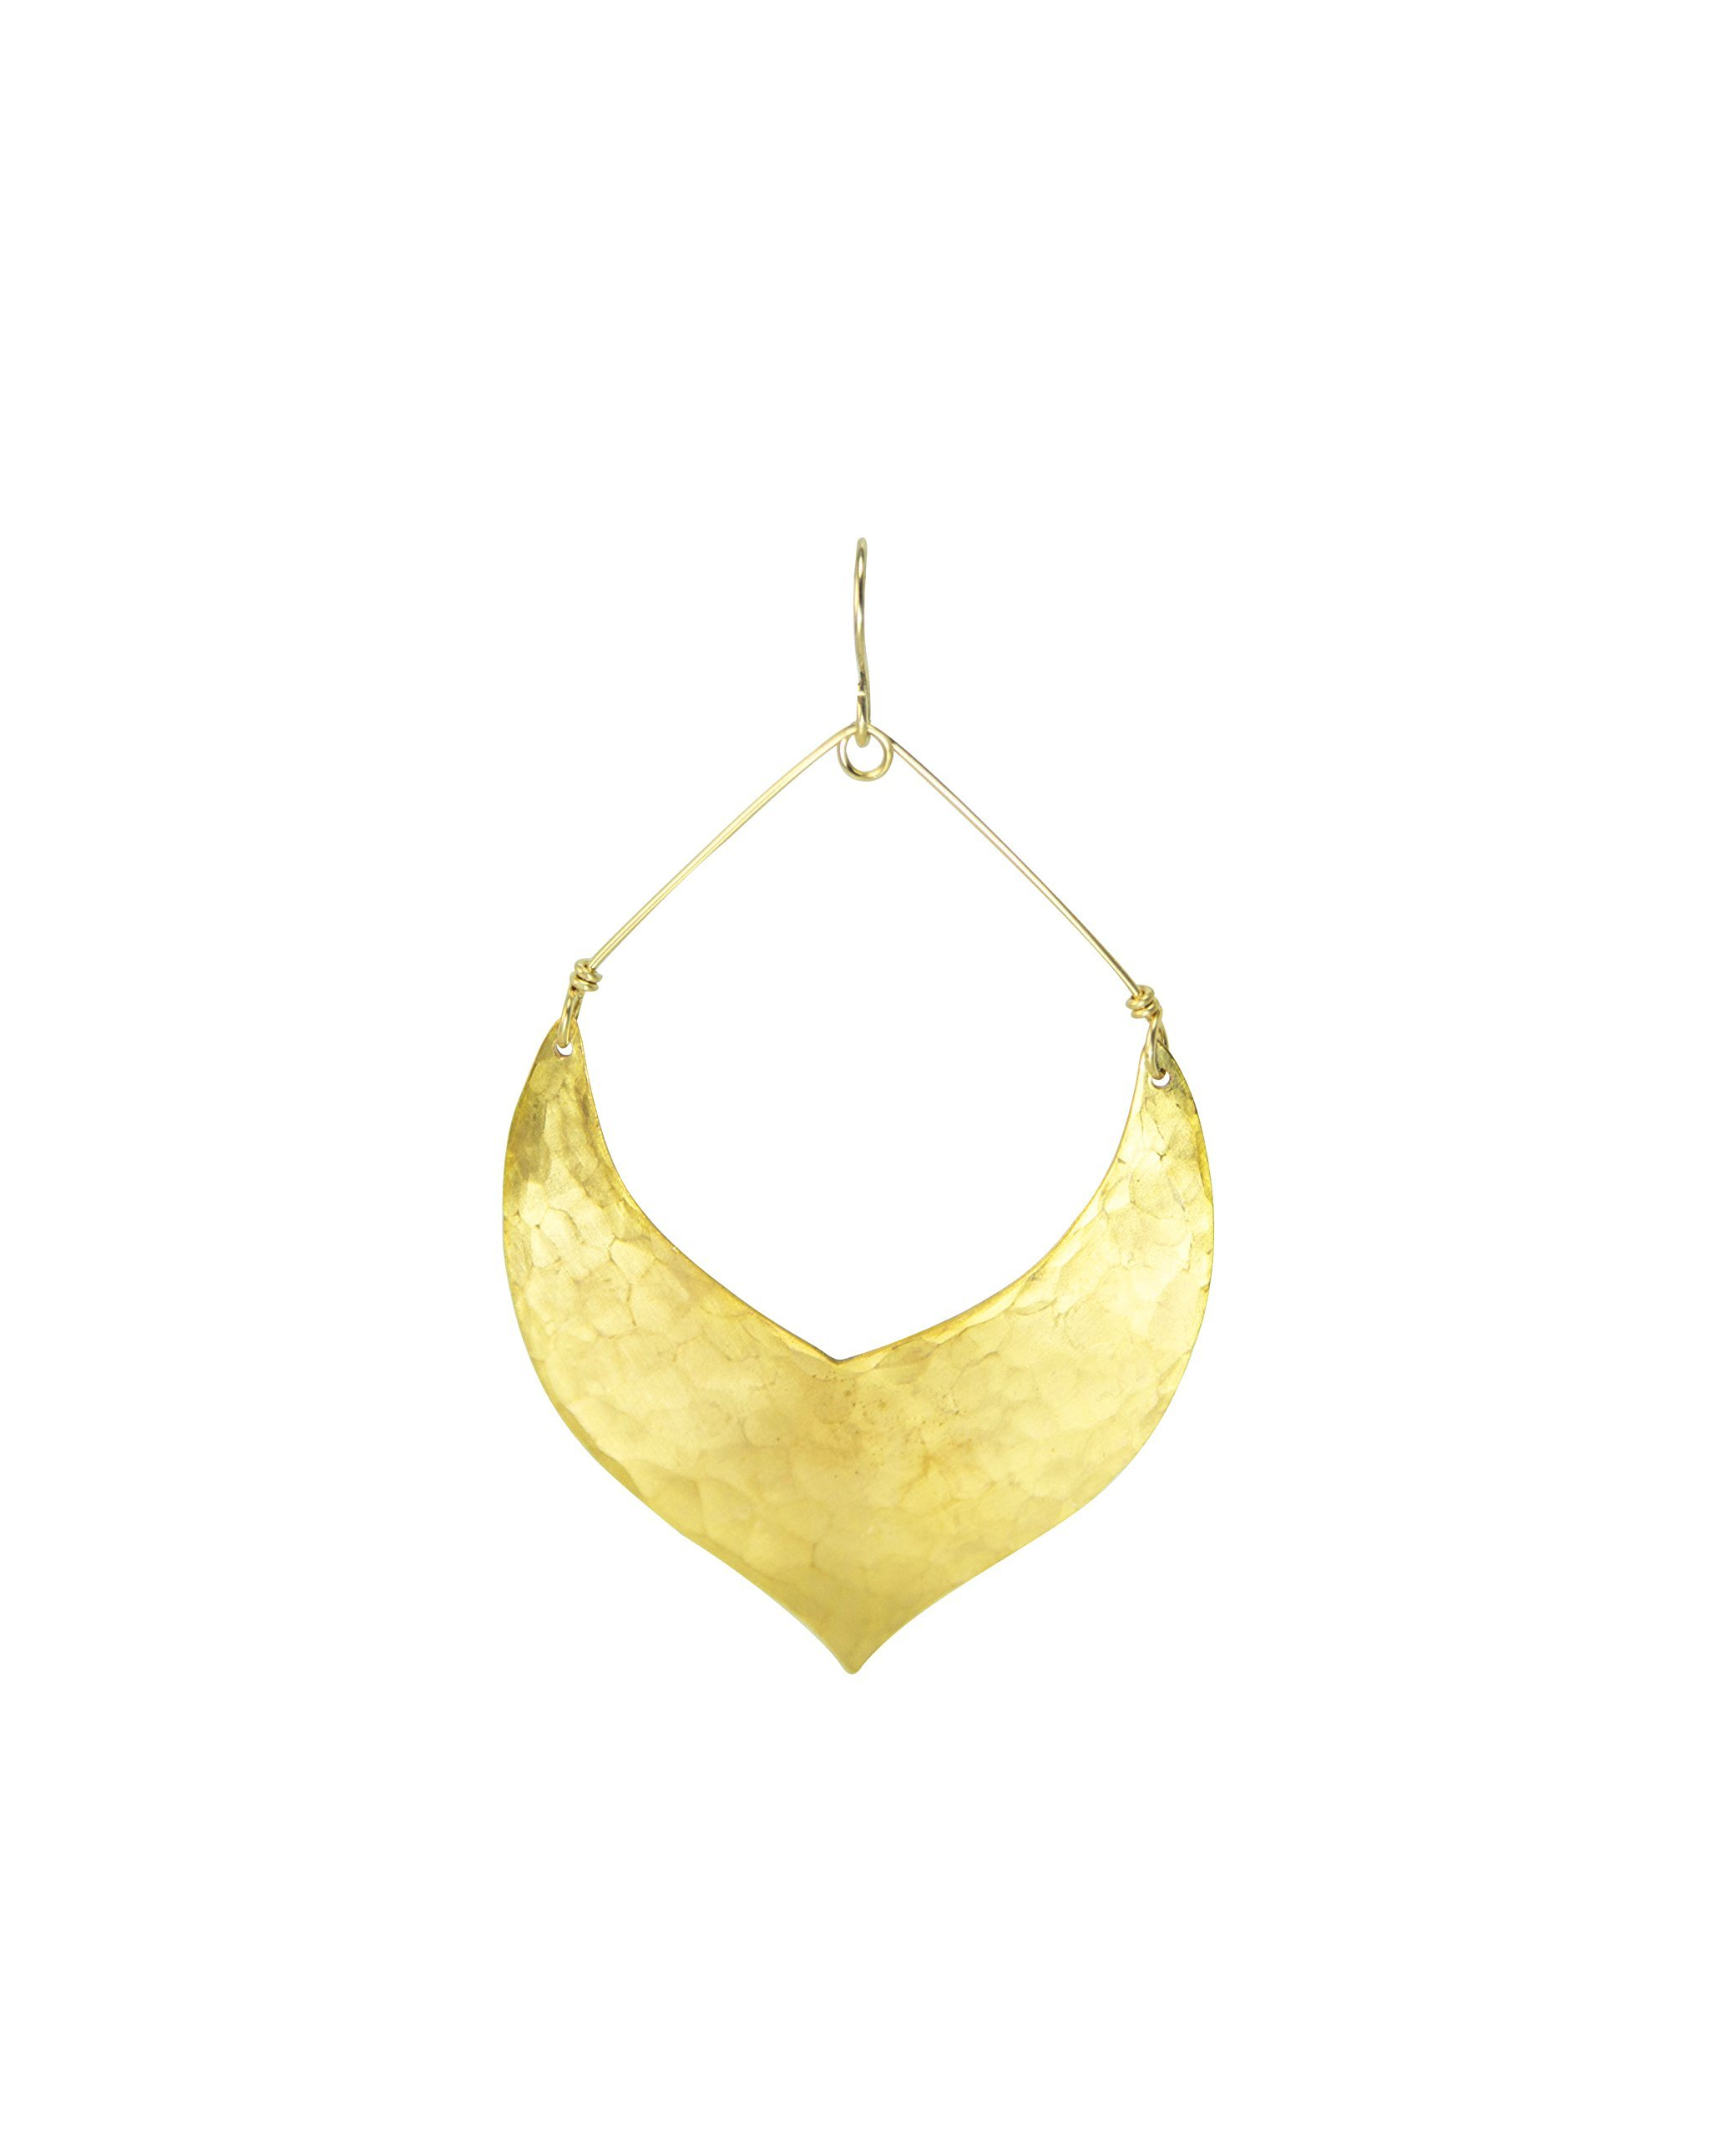 Lotus Moroccan Earring